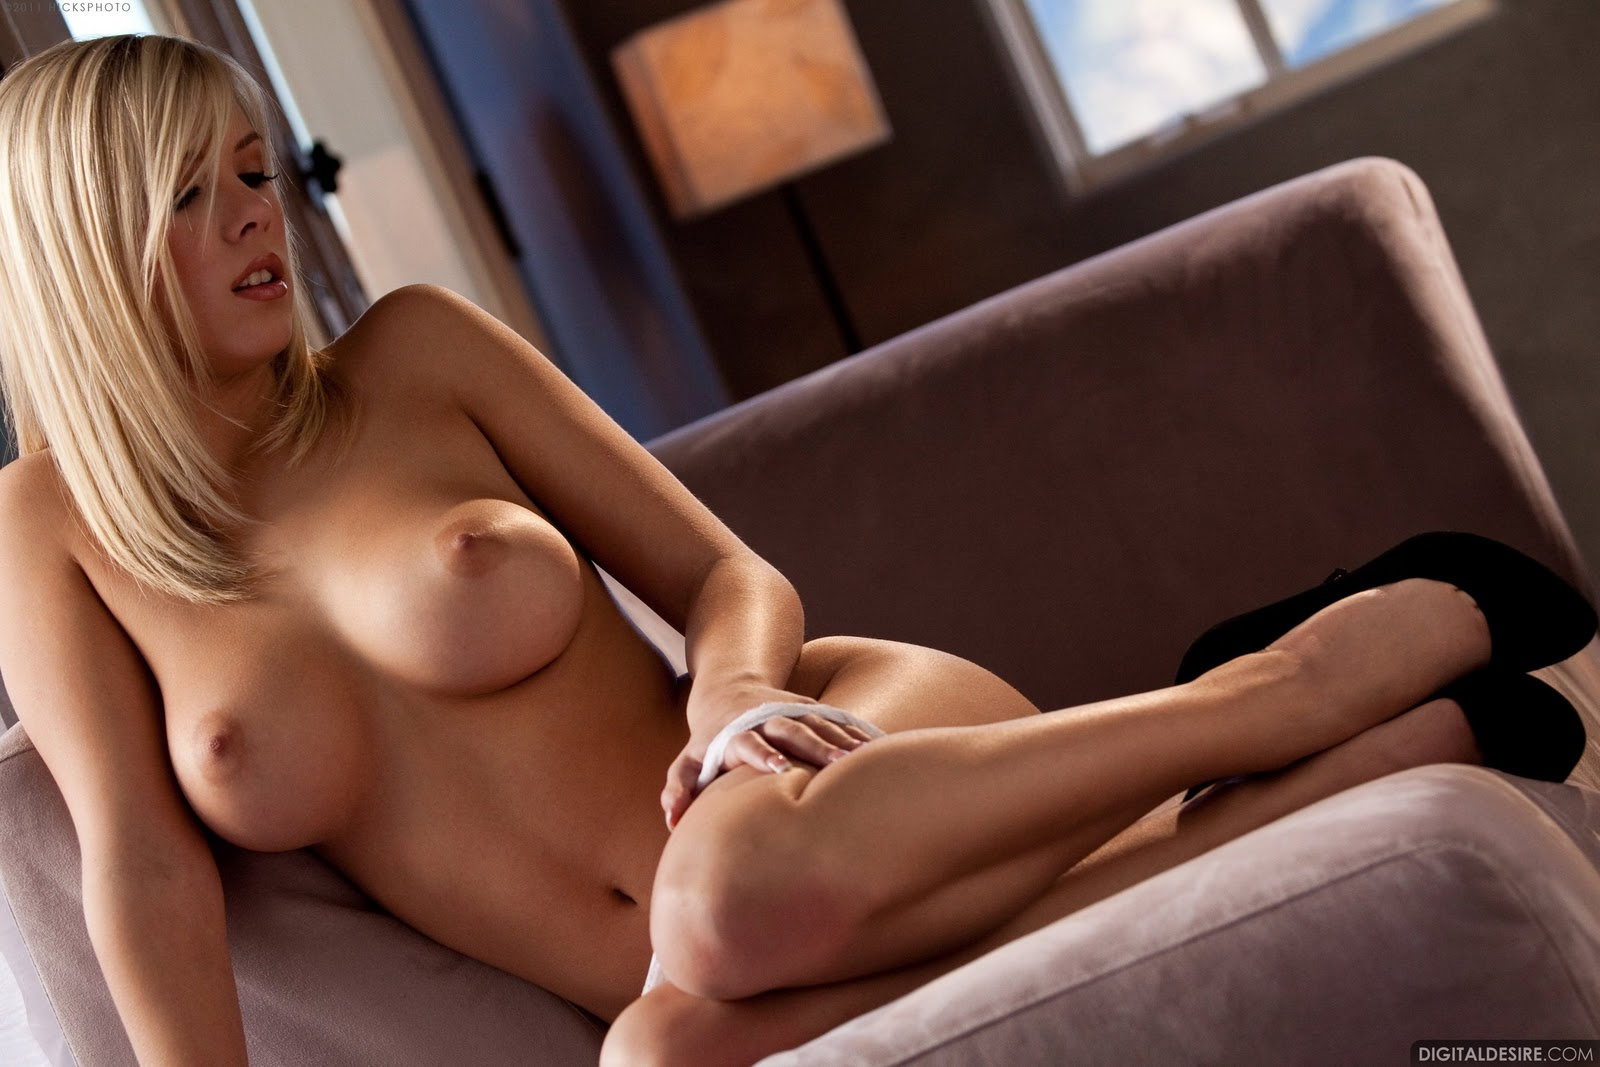 Conan porn images sex videos